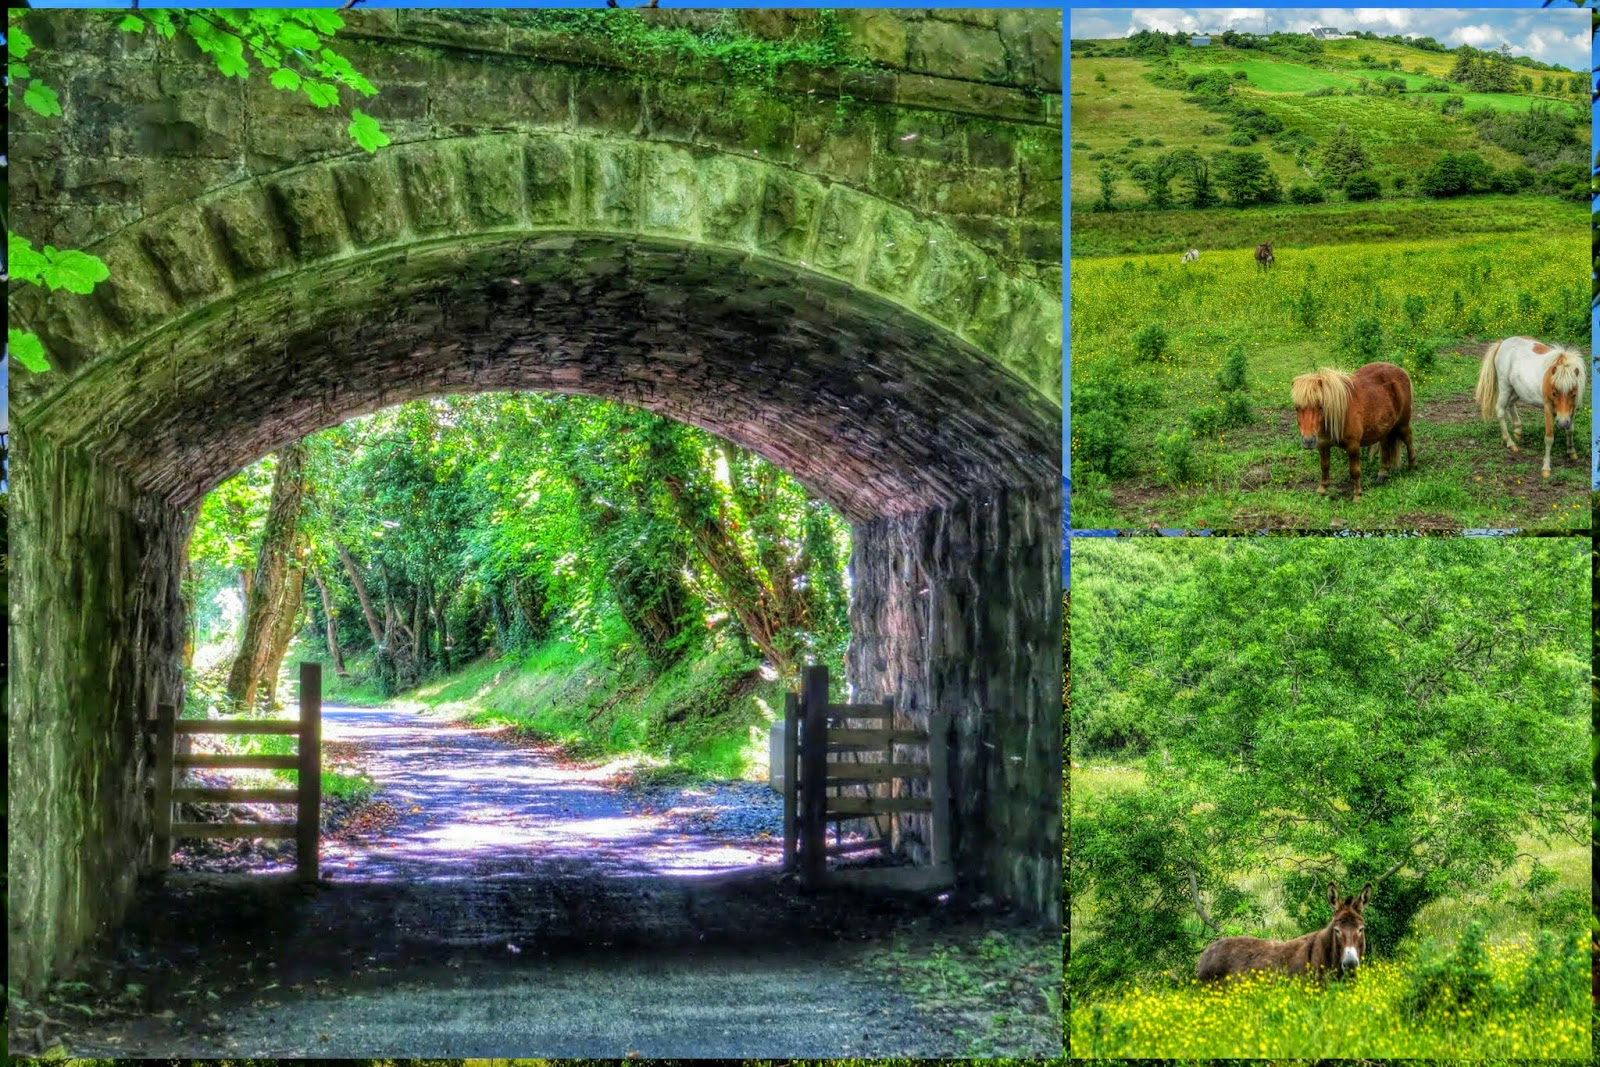 Mayo - Great Western Greenway